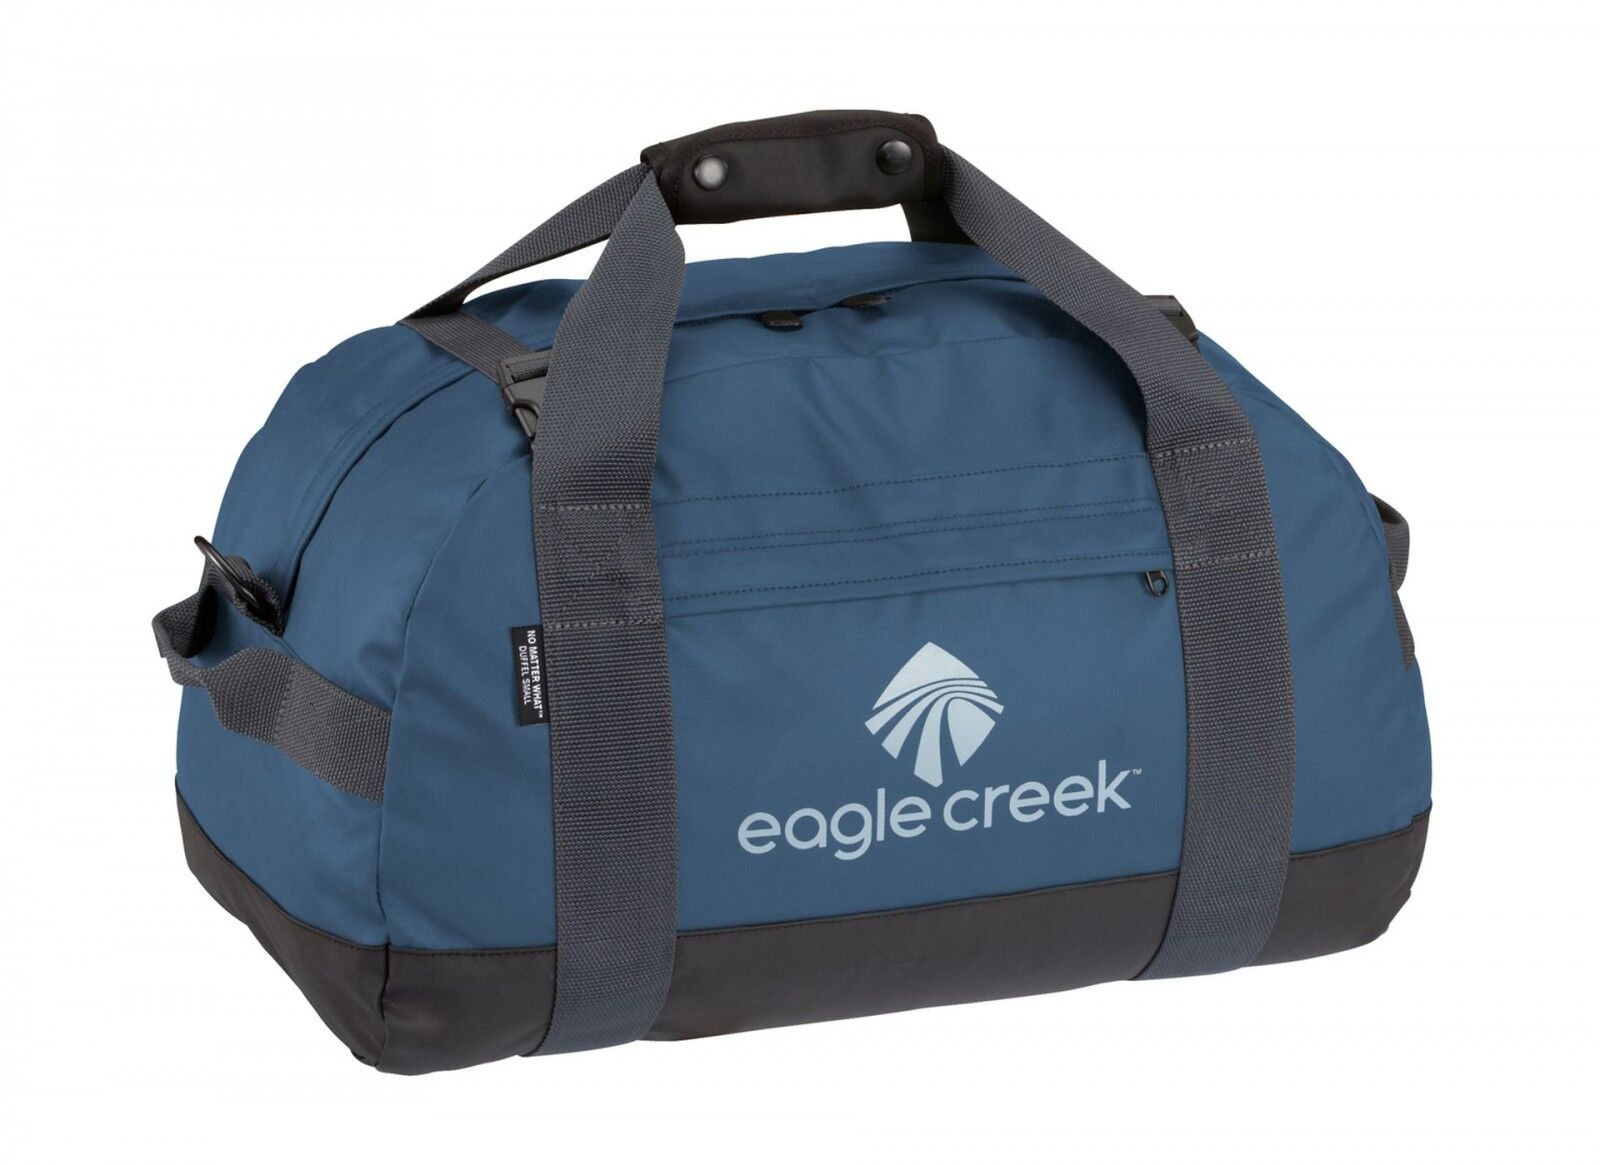 Eagle Creek Sac de voyage n'importe quoi Duffel S Blau slate